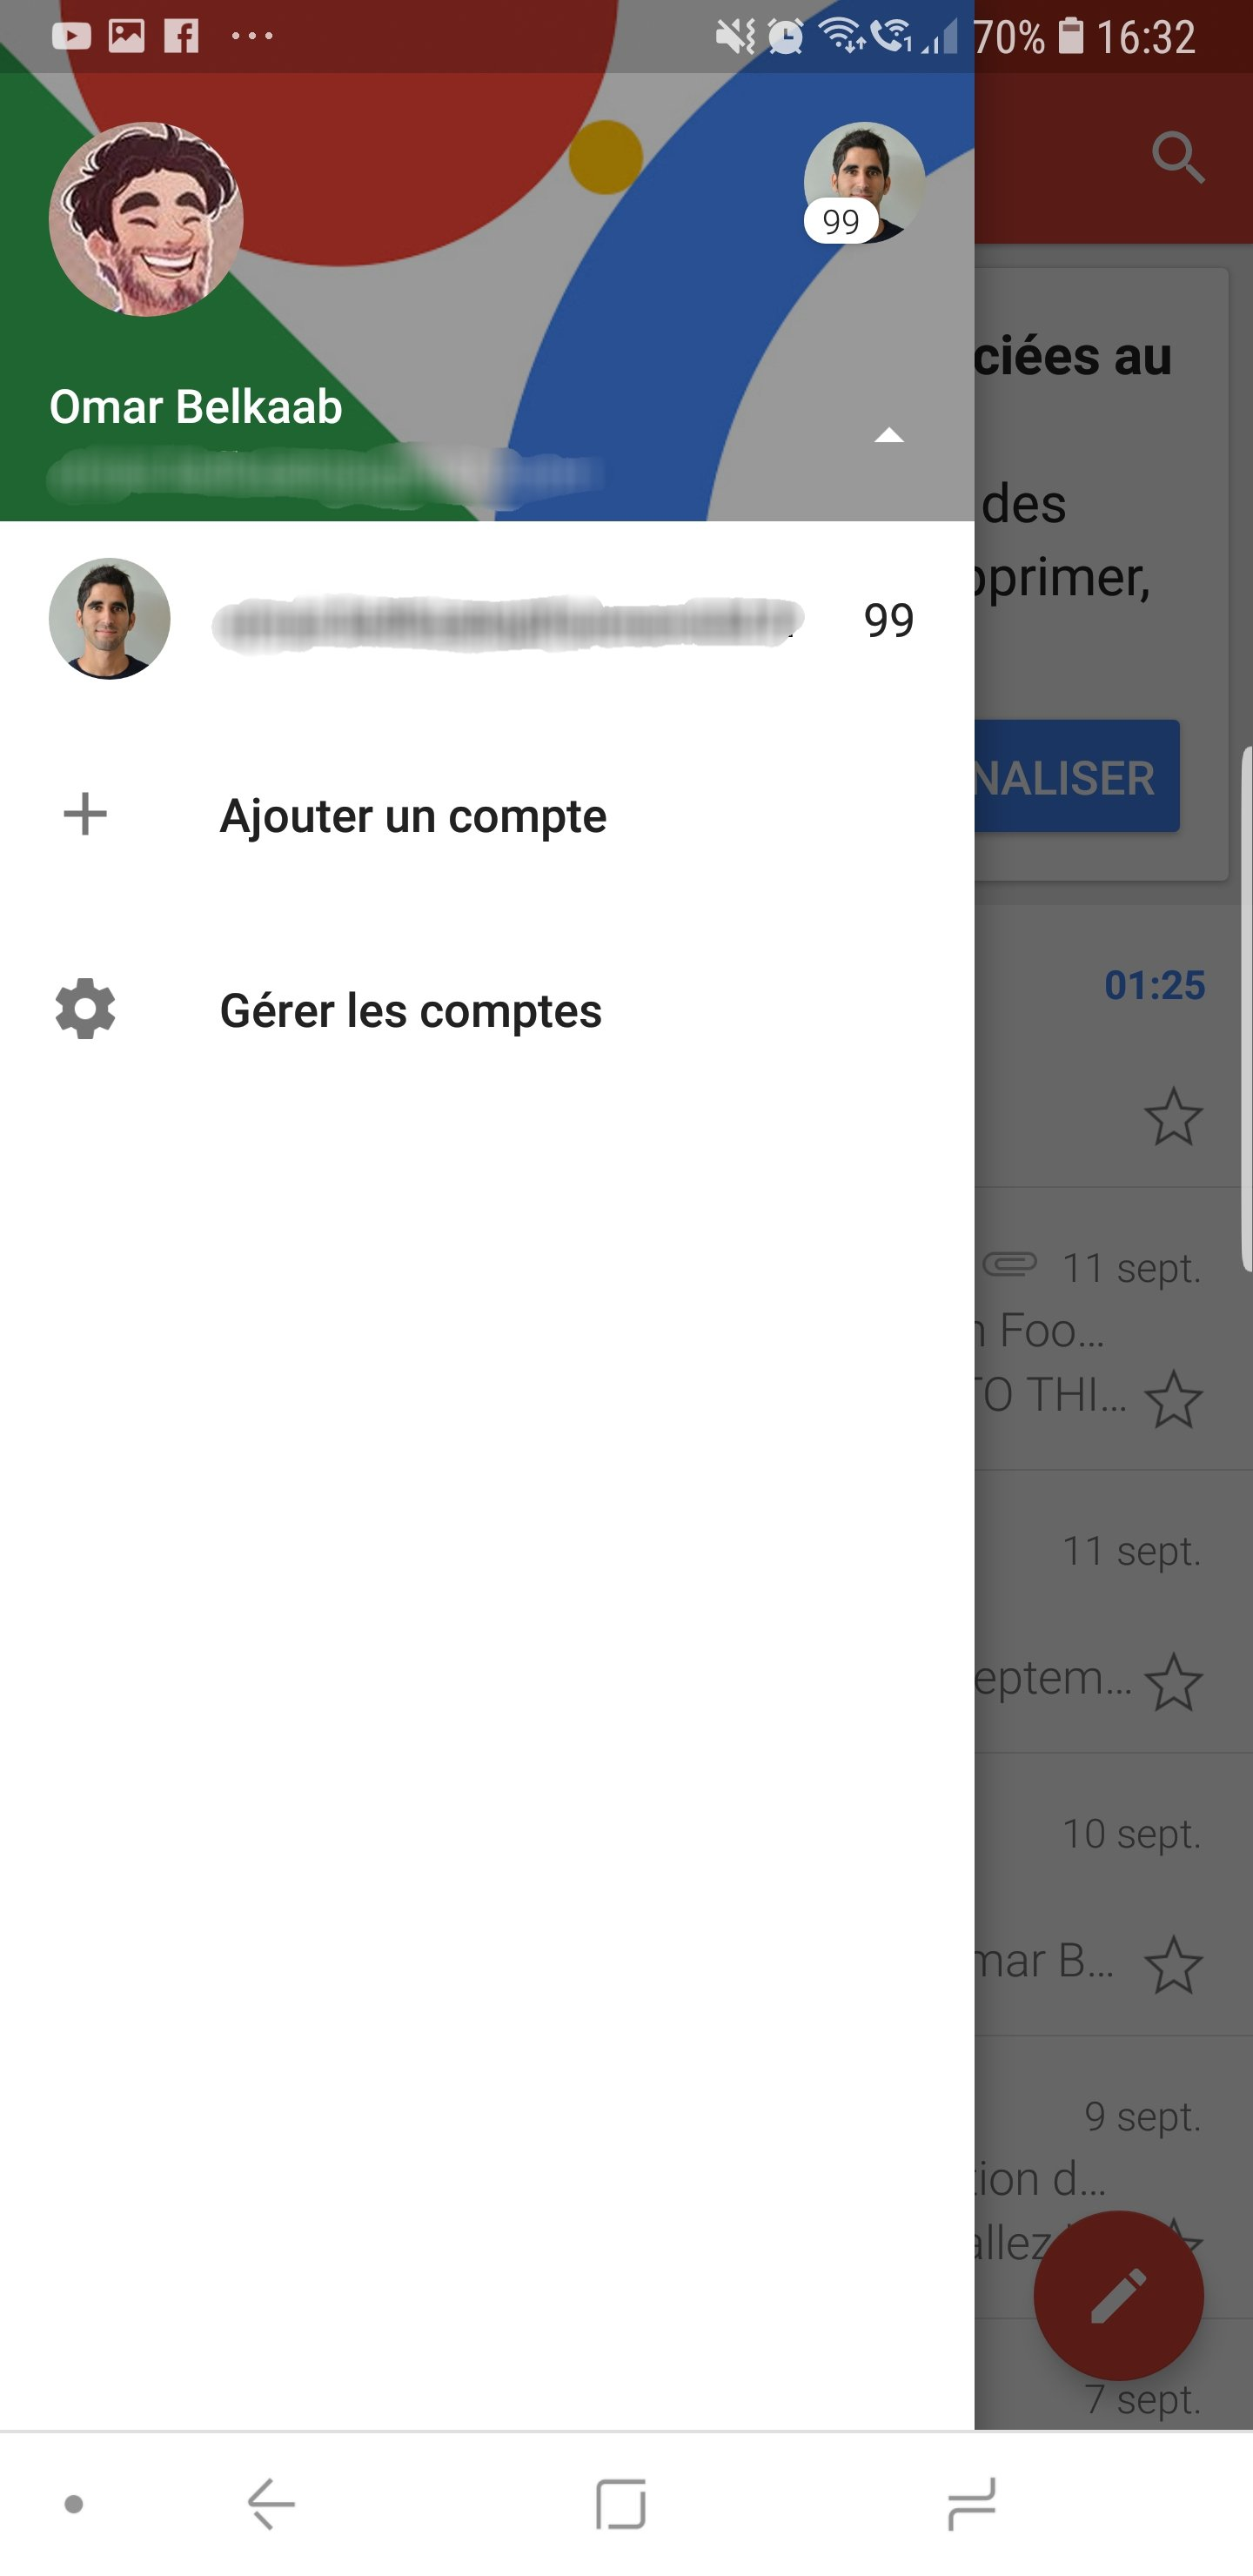 telecharger gmail notifier en francais